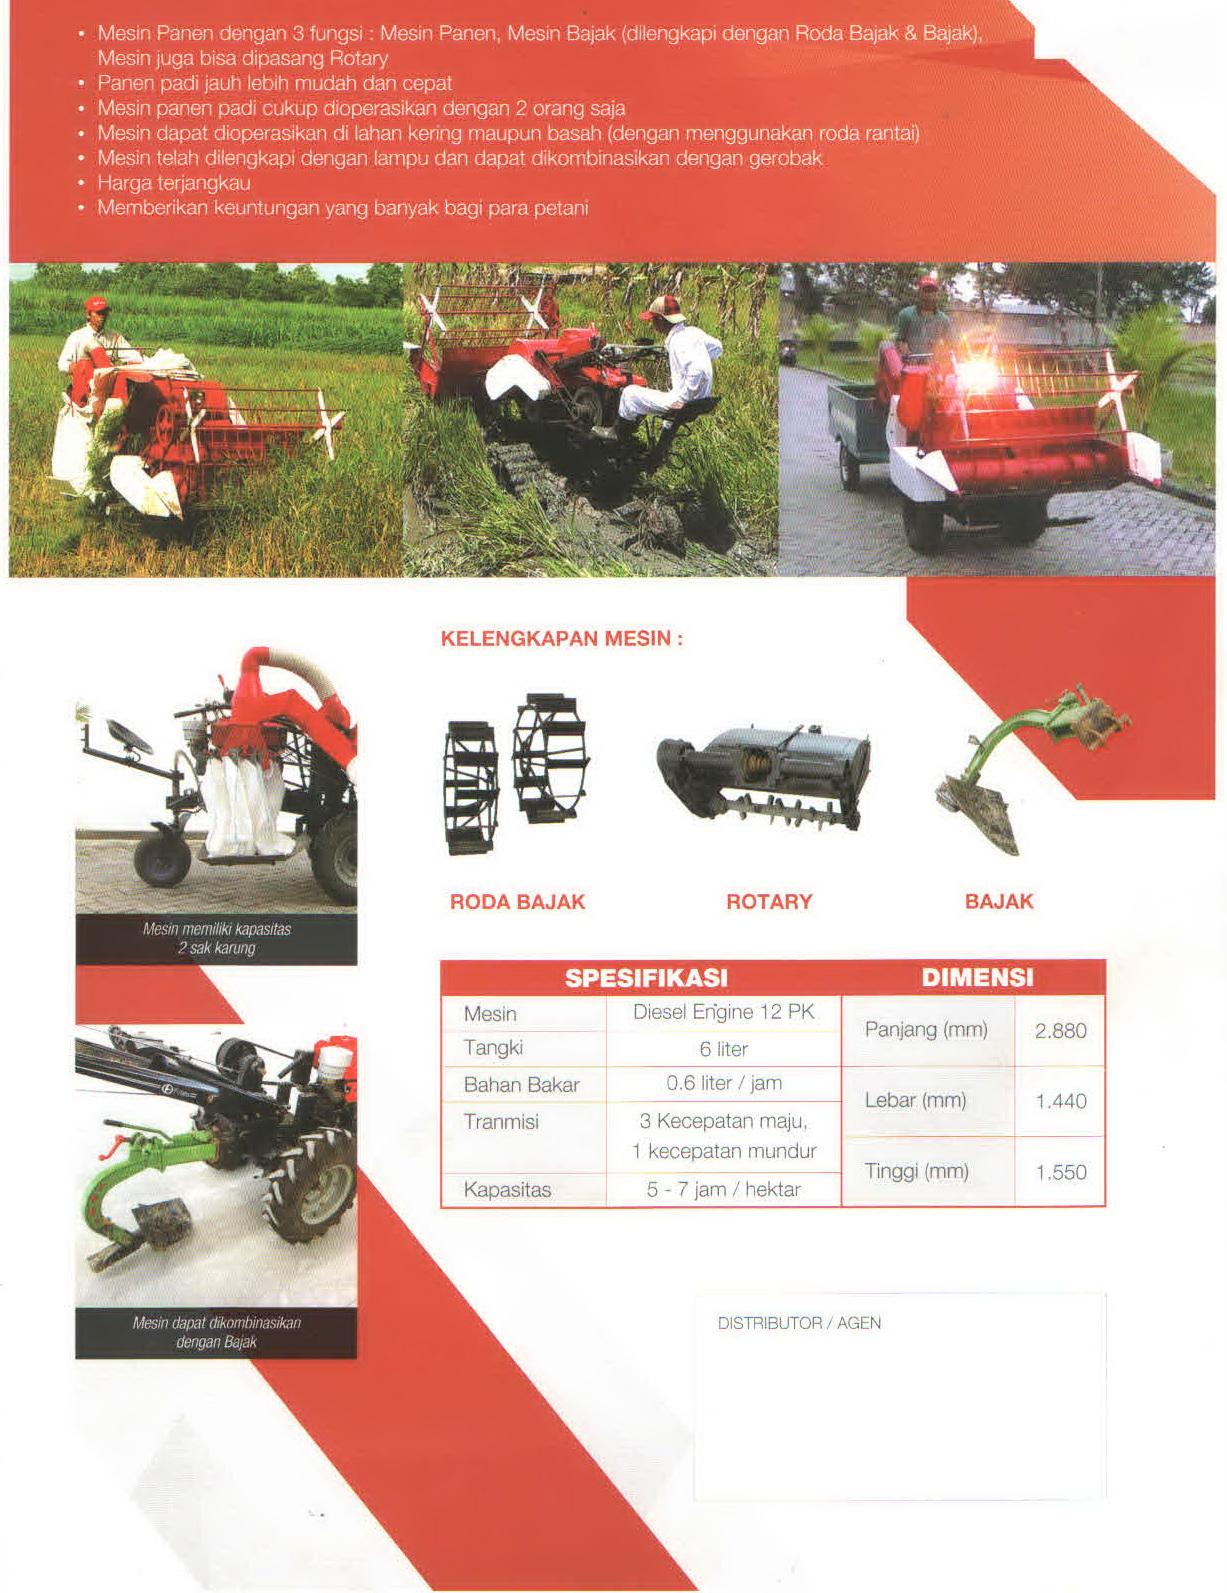 Contoh Proposal Agrobisnis Contoh Proposal Bantuan Dana Hibah Pemerintah Usaha Ktnapusat Koperasi Tani Kabupaten Karawang Prototype Mesin Pemotong